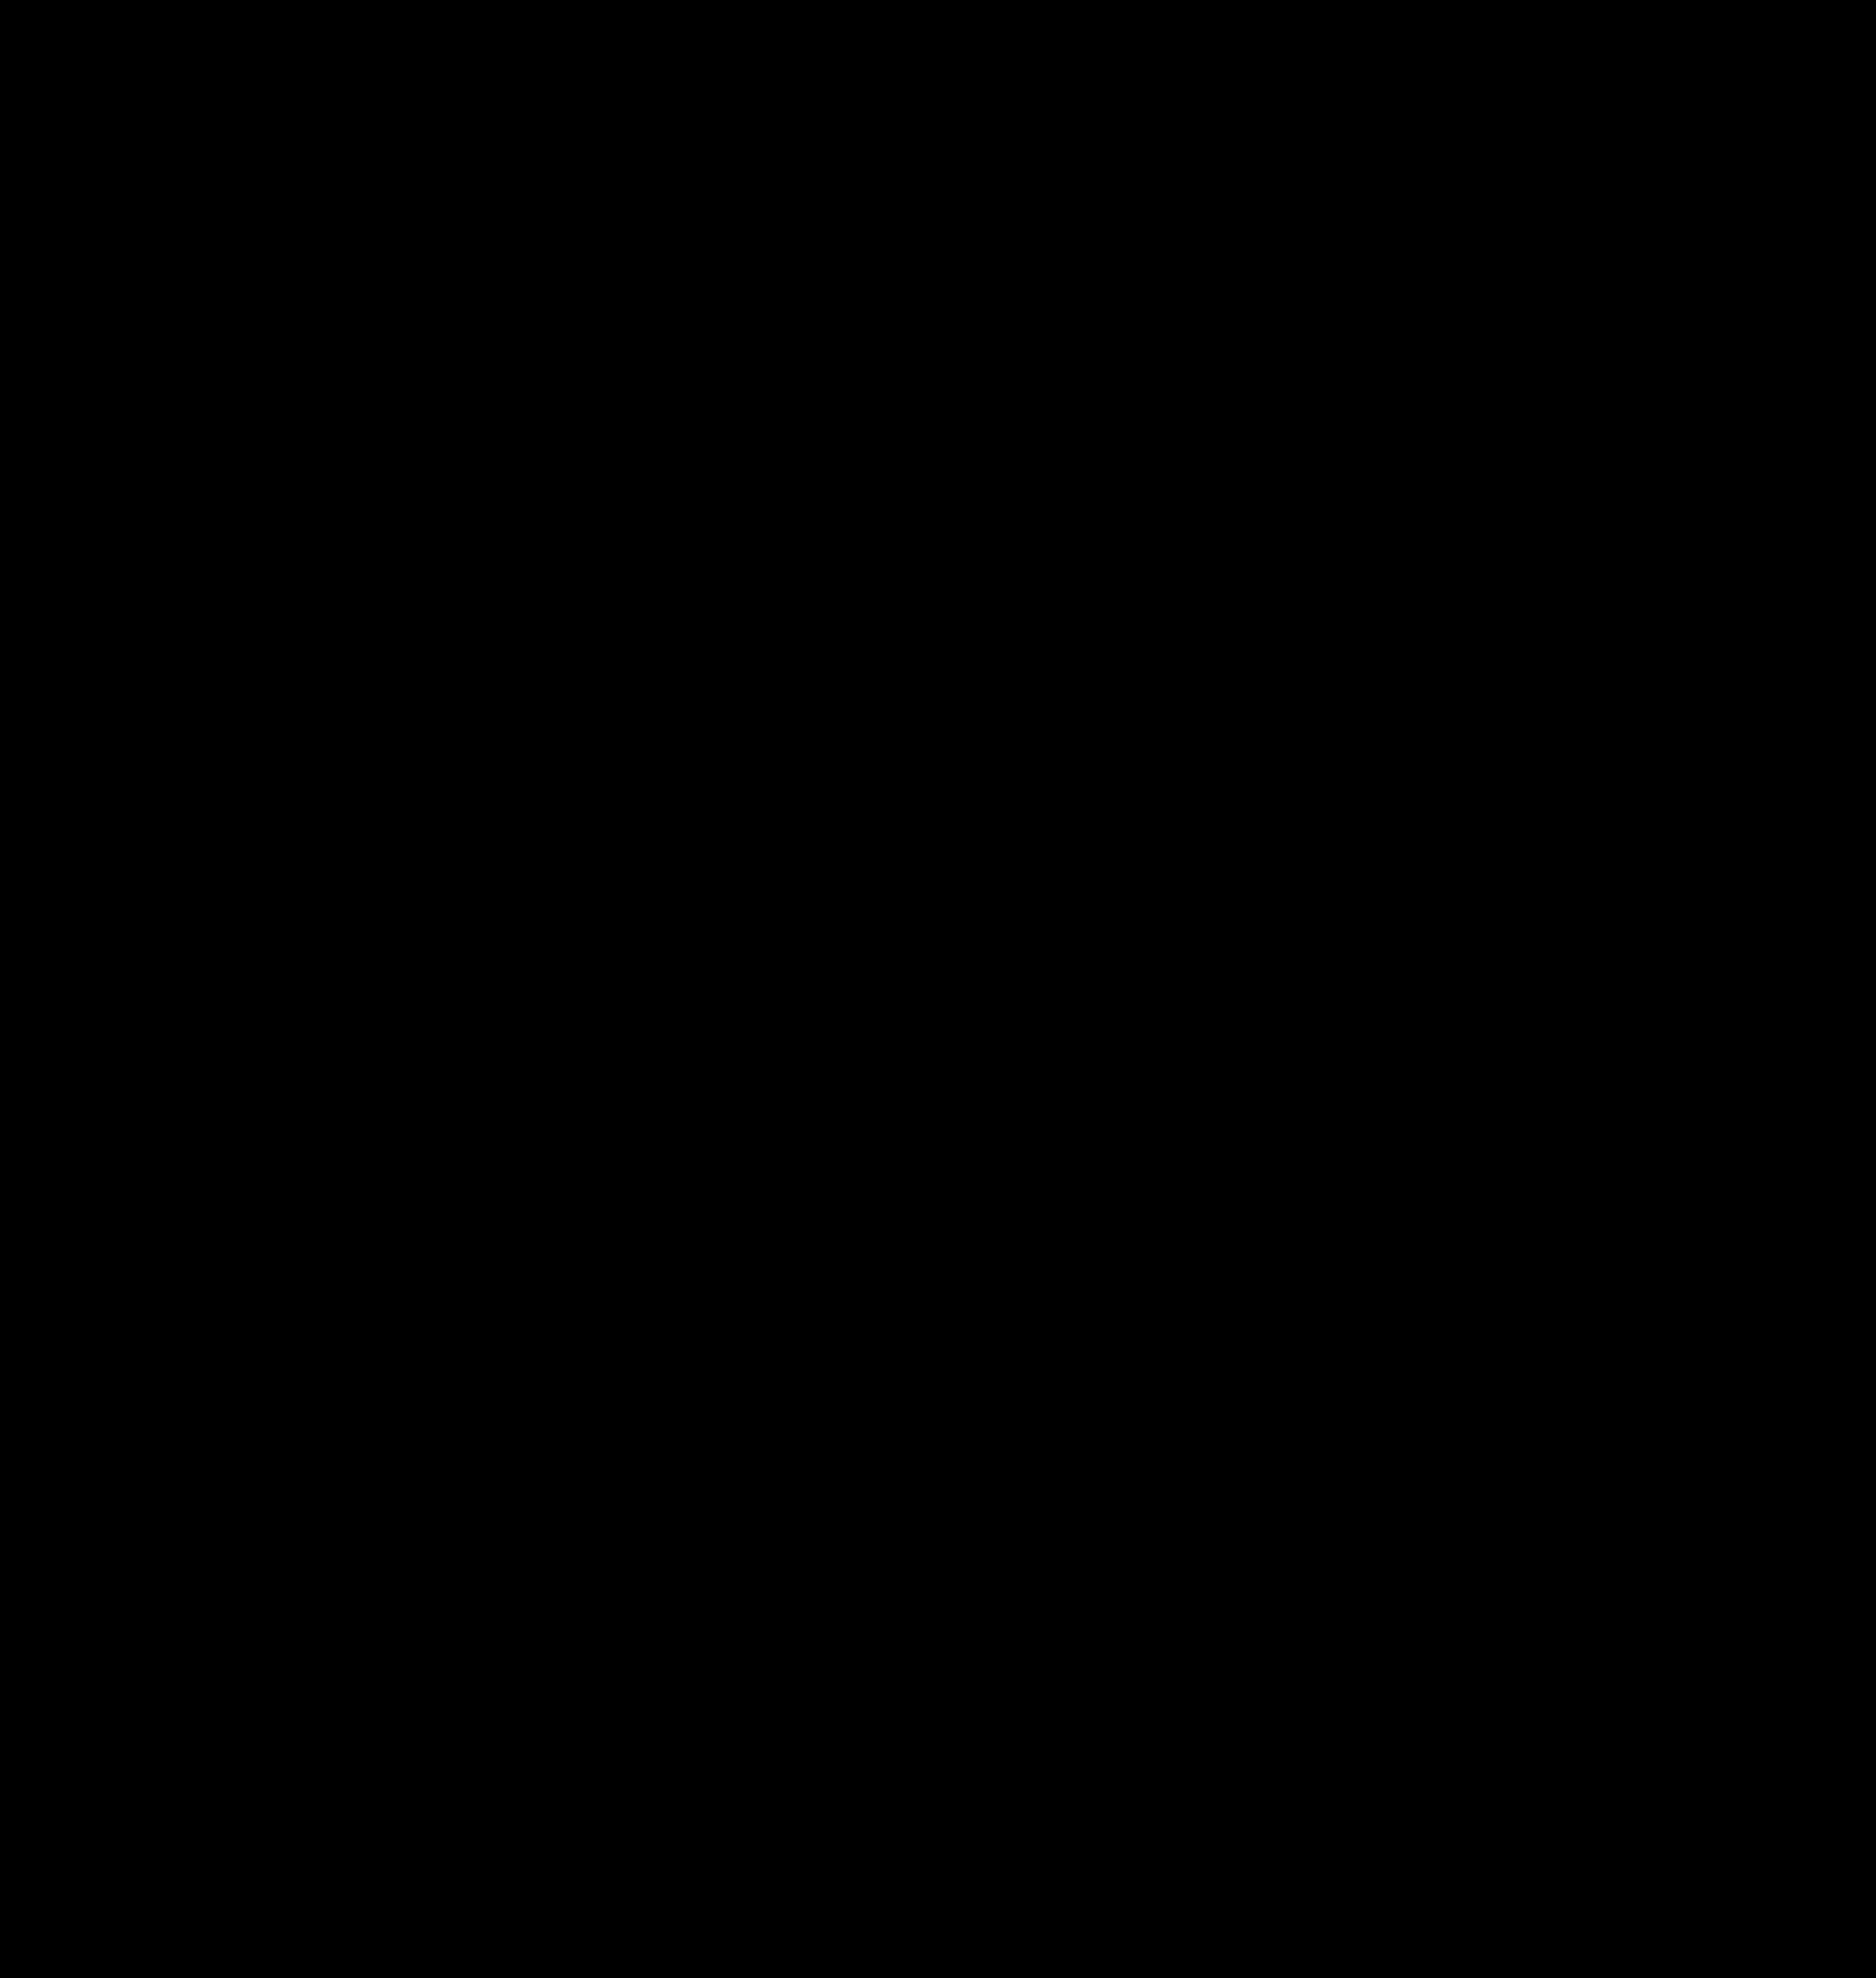 Floral silhouette big image. Clipart heart design